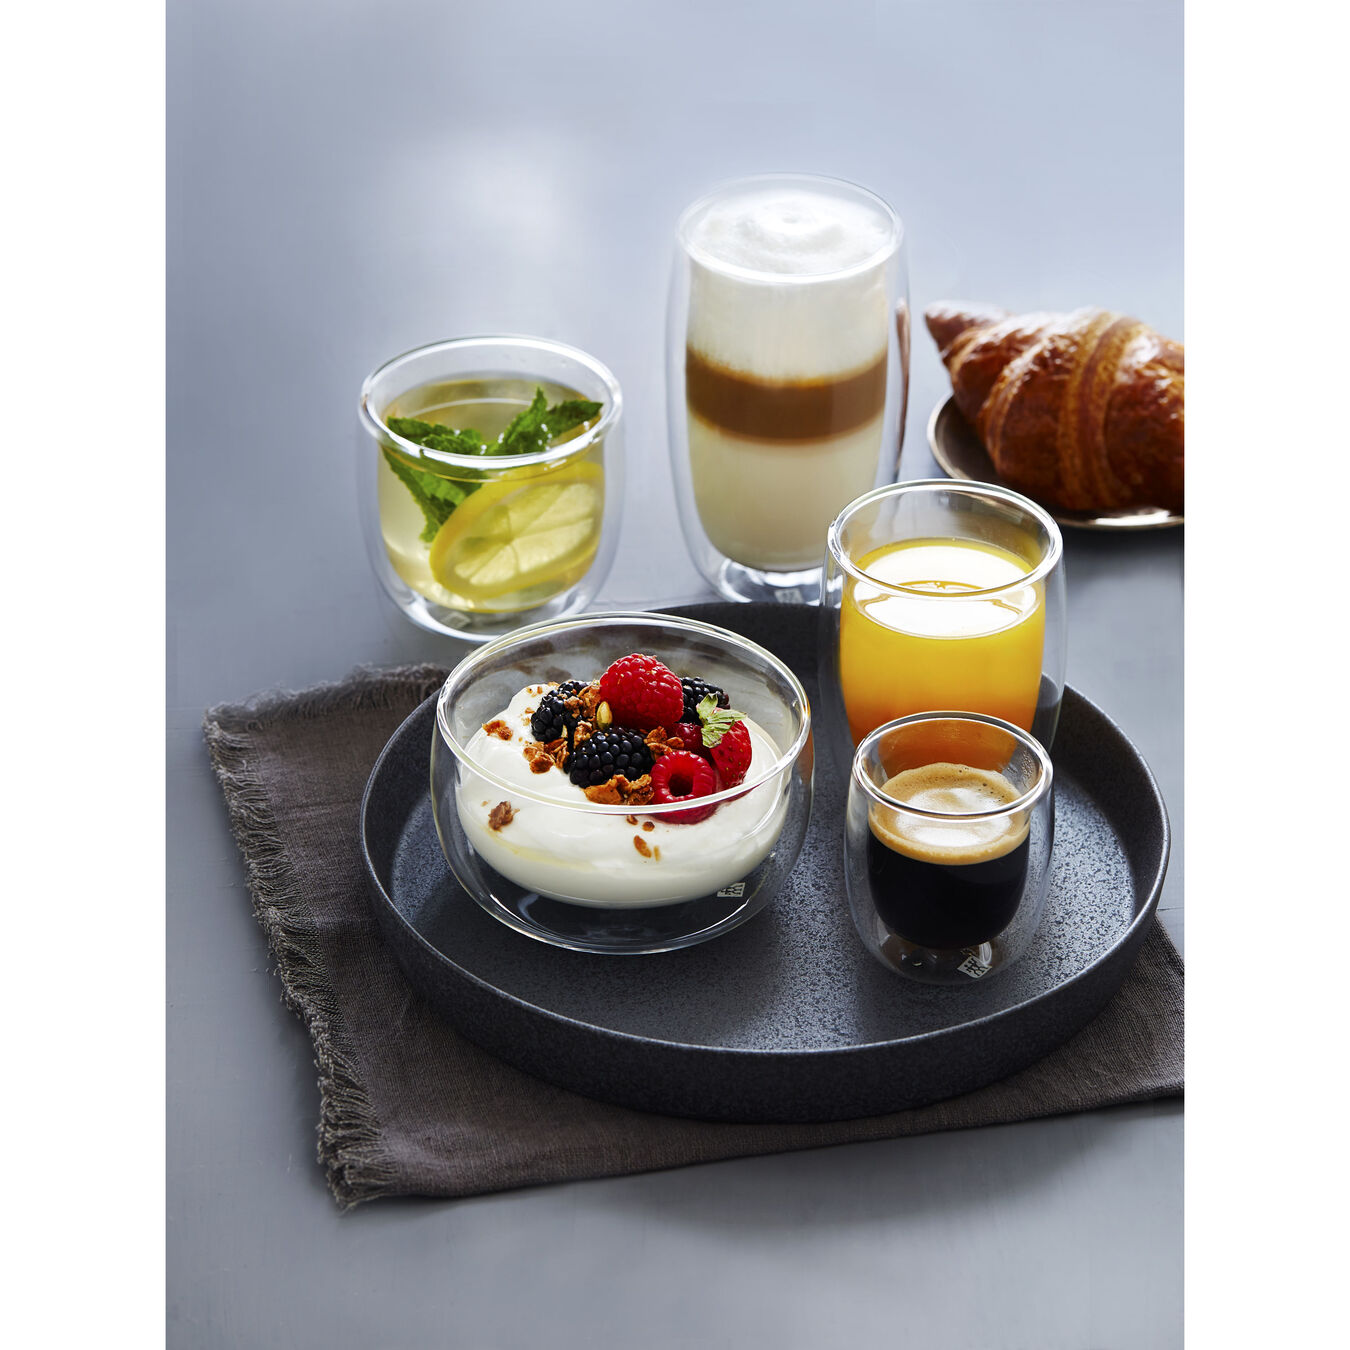 8 Piece Latte Glass Set - Value Pack,,large 5